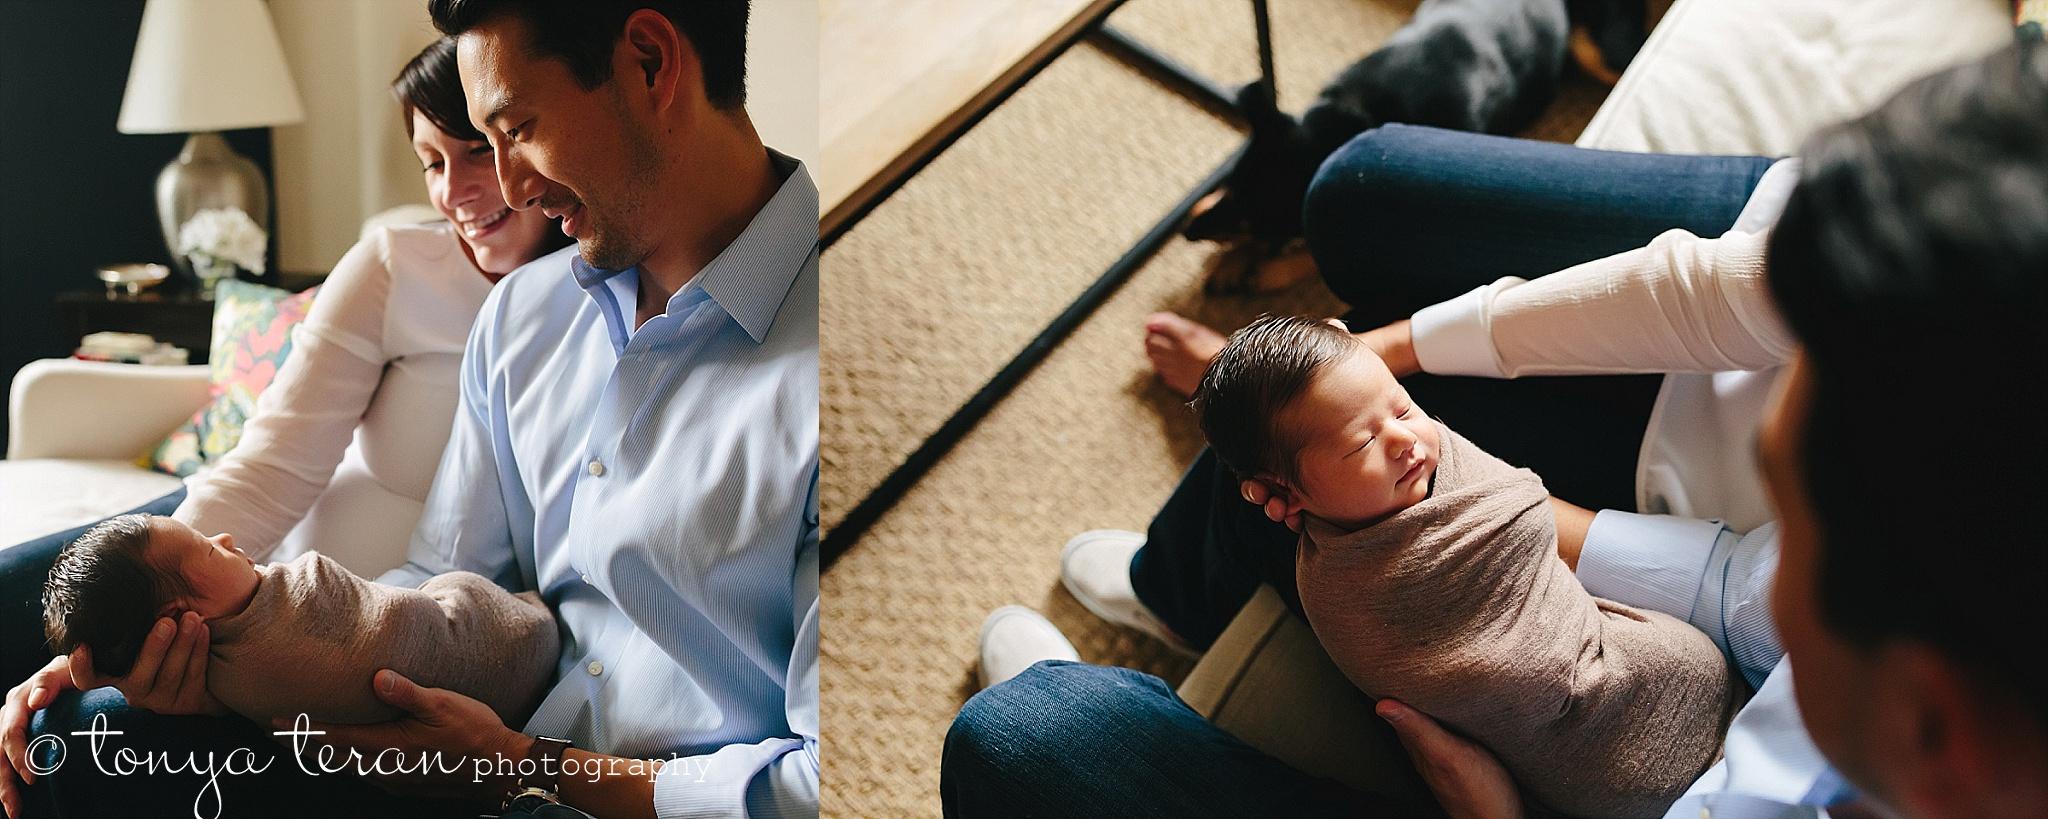 Newborn Photo Session | Tonya Teran Photography, Washington, DC Newborn, Baby, and Family Photographer